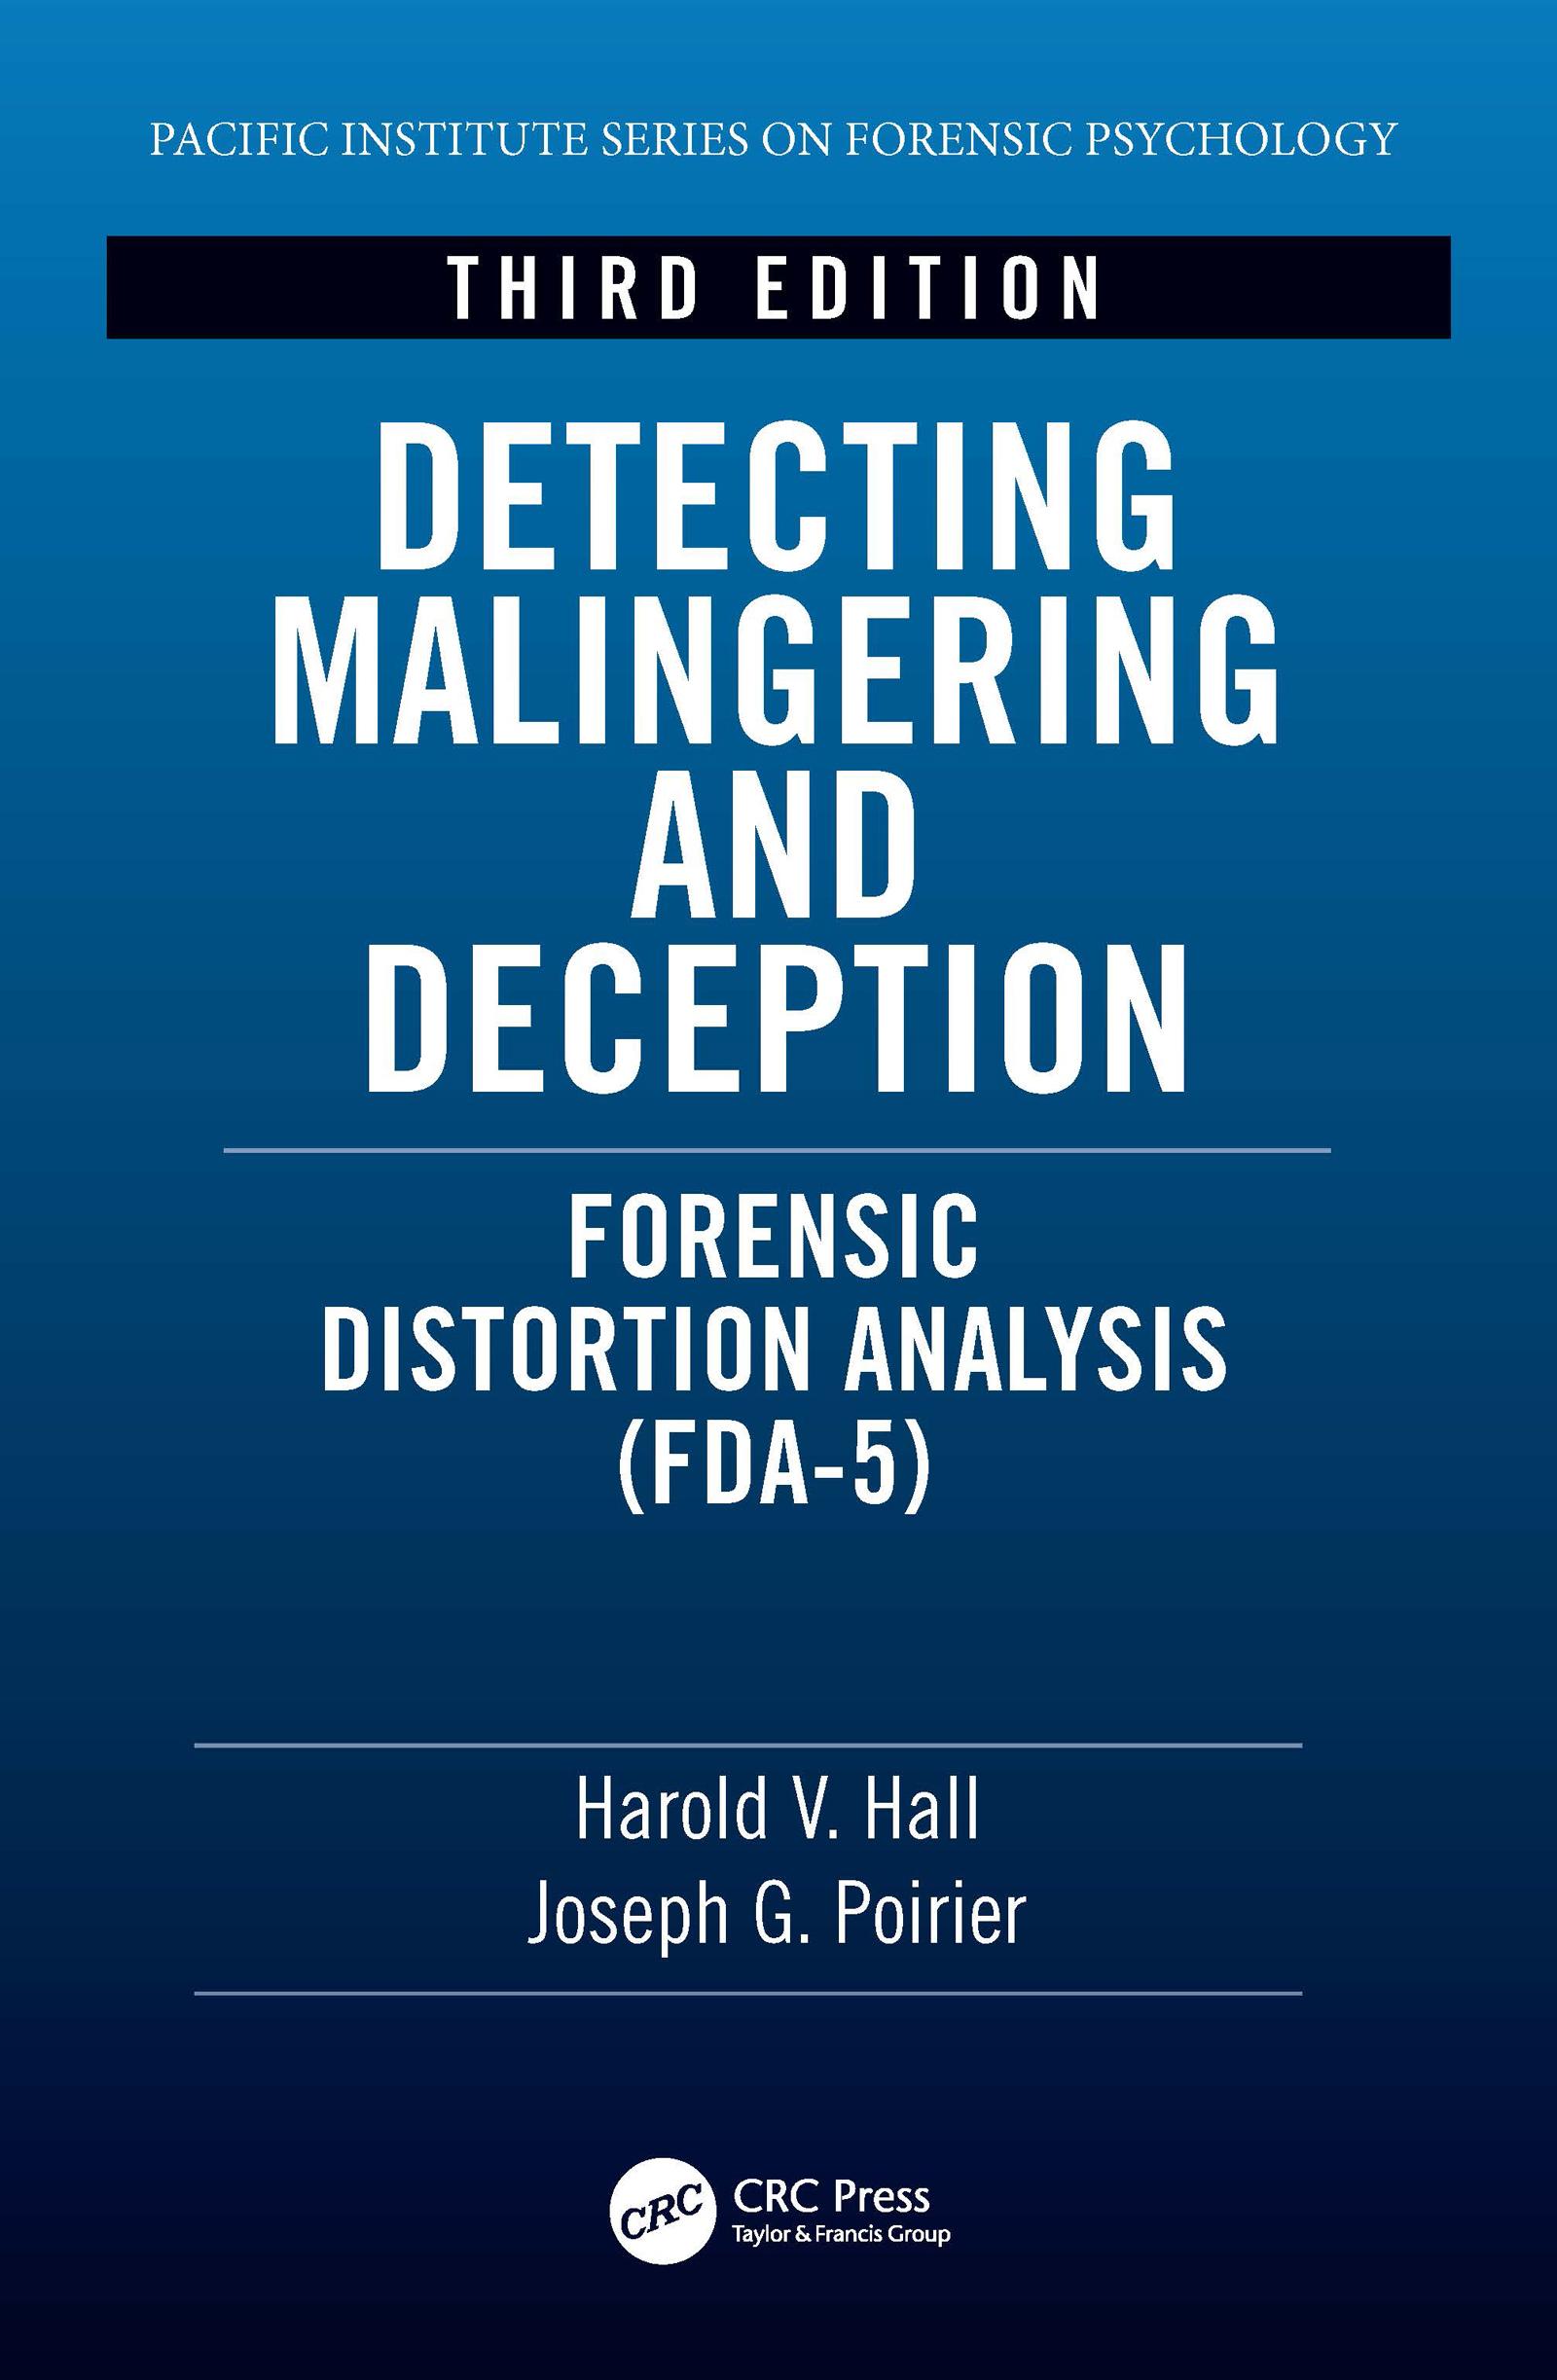 Deception and Nonverbal Behavior